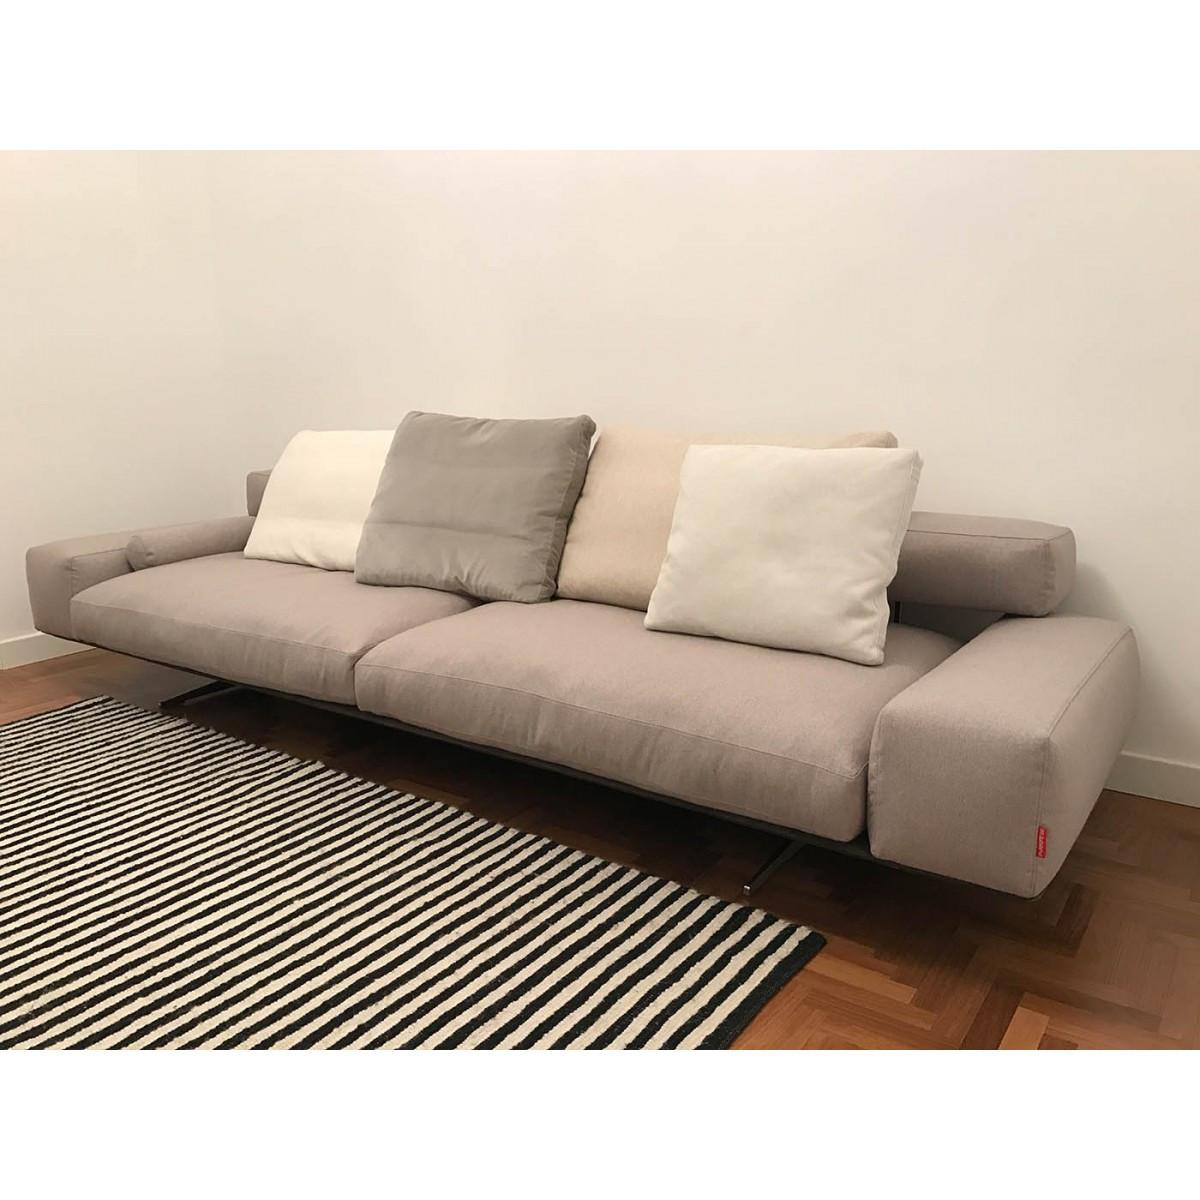 Sofa Outlet  Flexform Wing Sofa Outlet